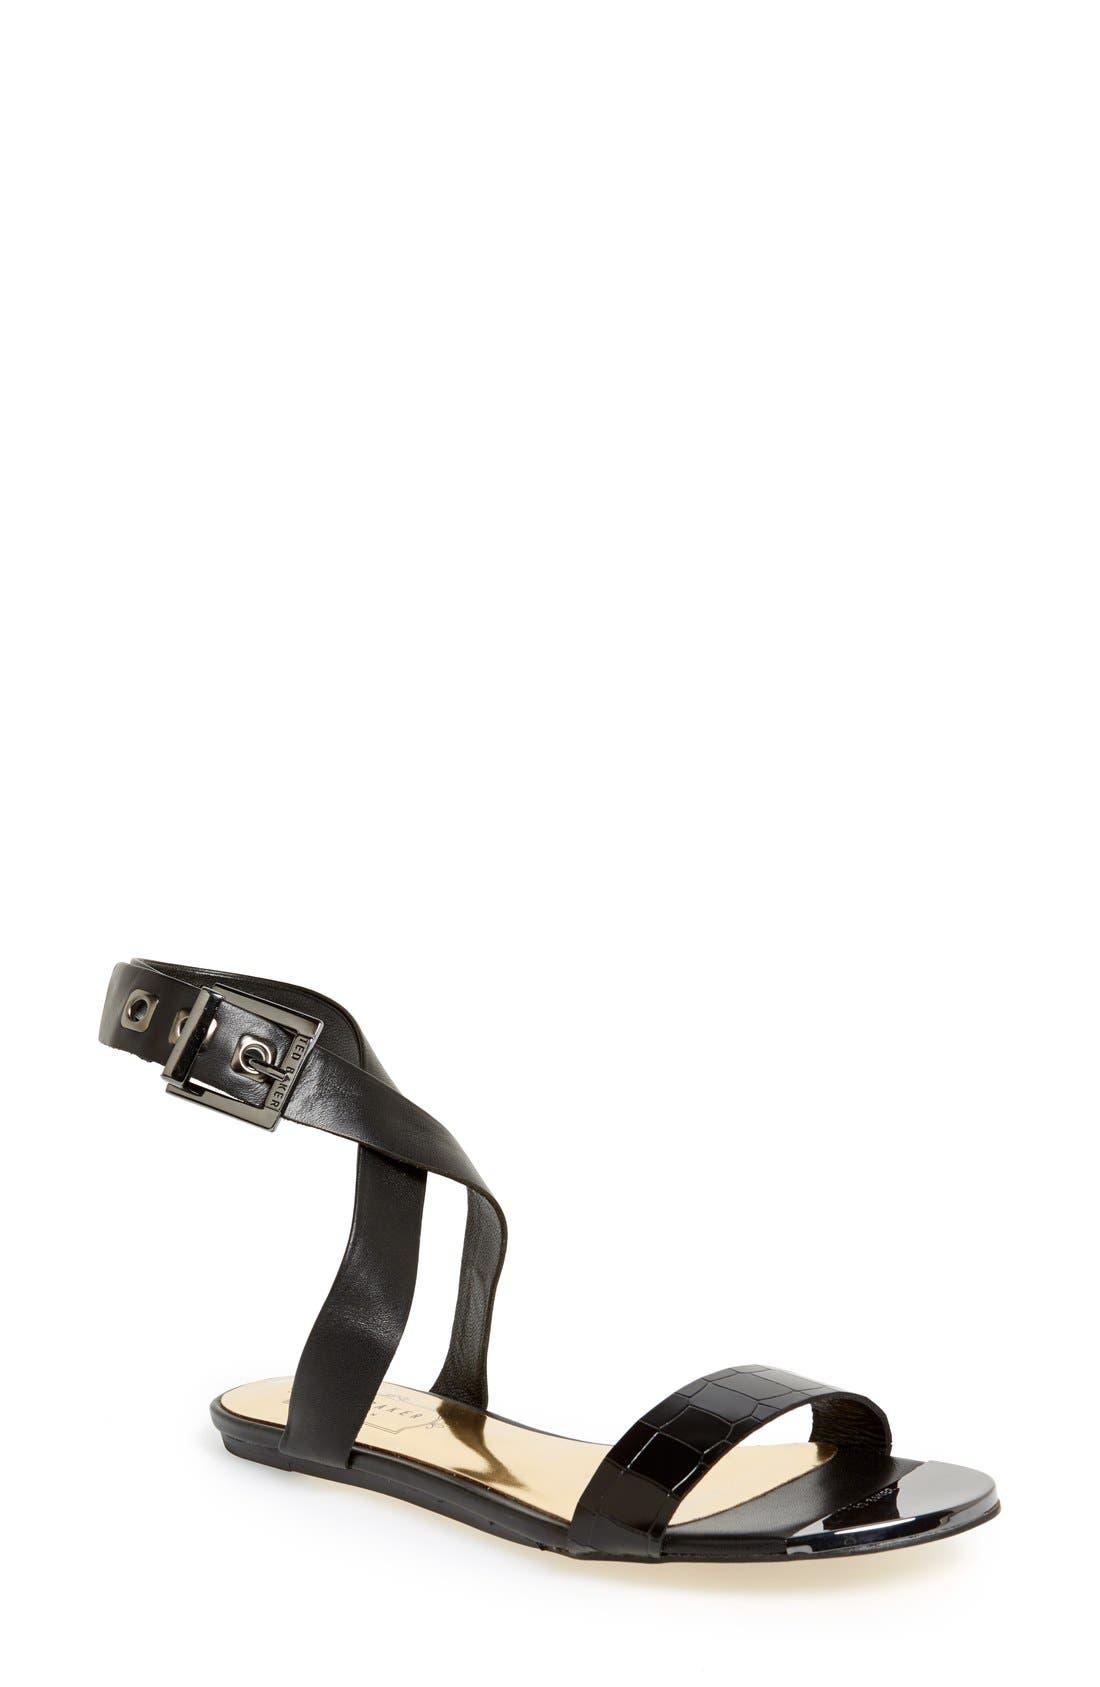 Main Image - Ted Baker London 'Tabbey' Sandal